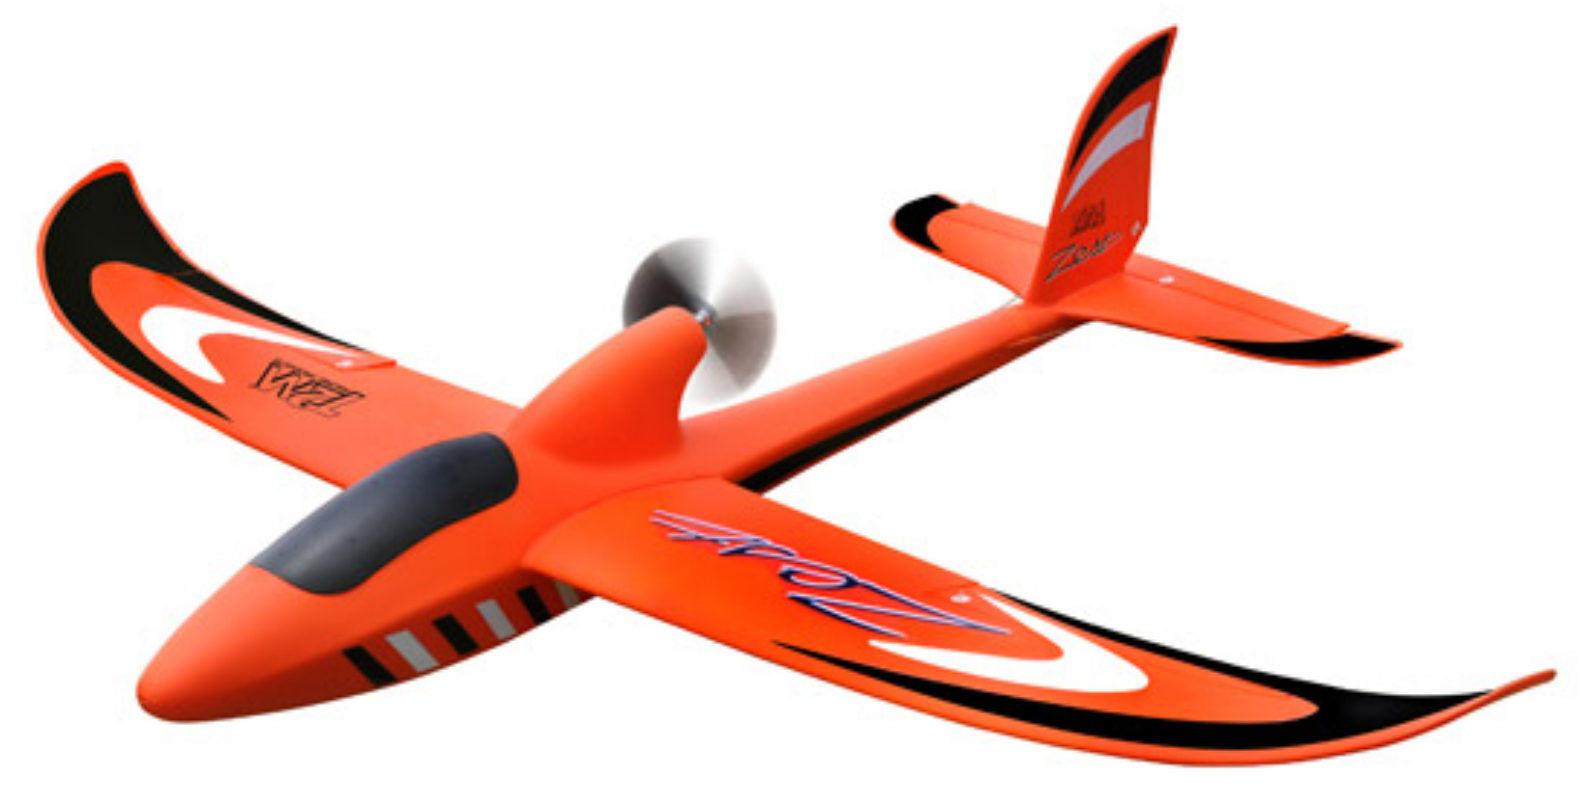 T2M T4511 ZEST VELIERO ELETTRICO BRUSHLESS MOTORE ARF 1420mm apertura alare